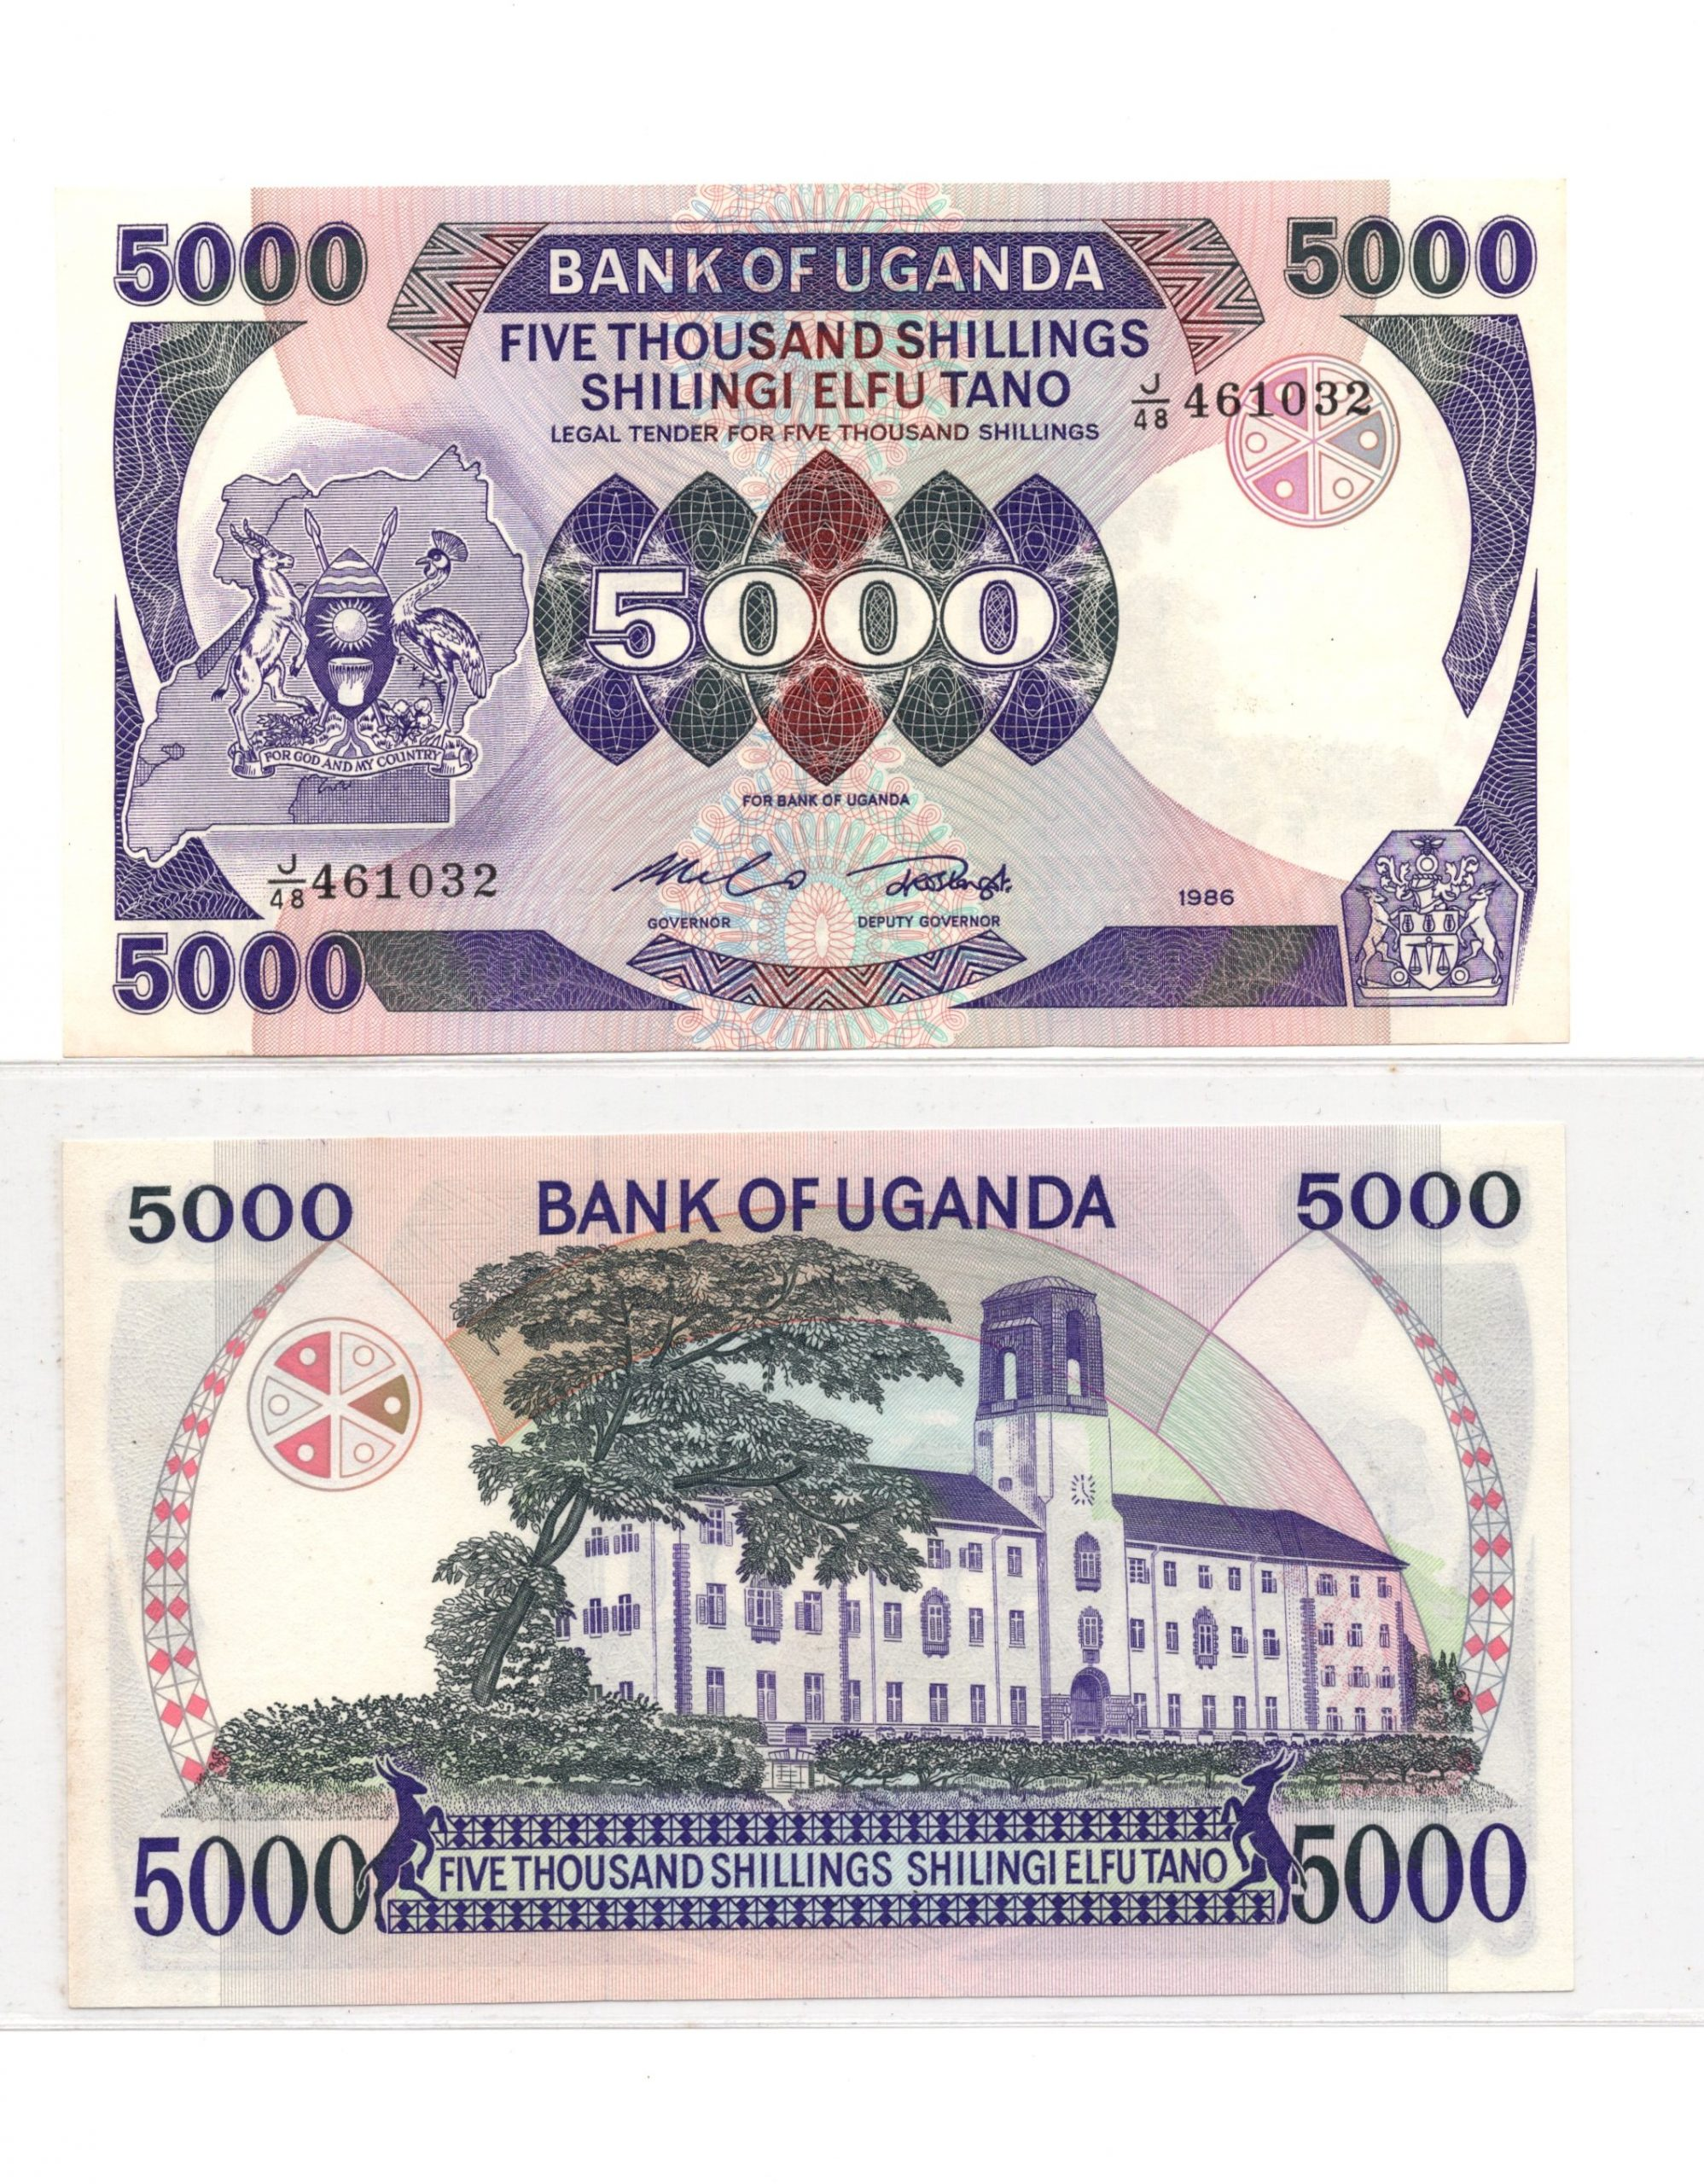 Ugana 5000 shillings 1986 banknote